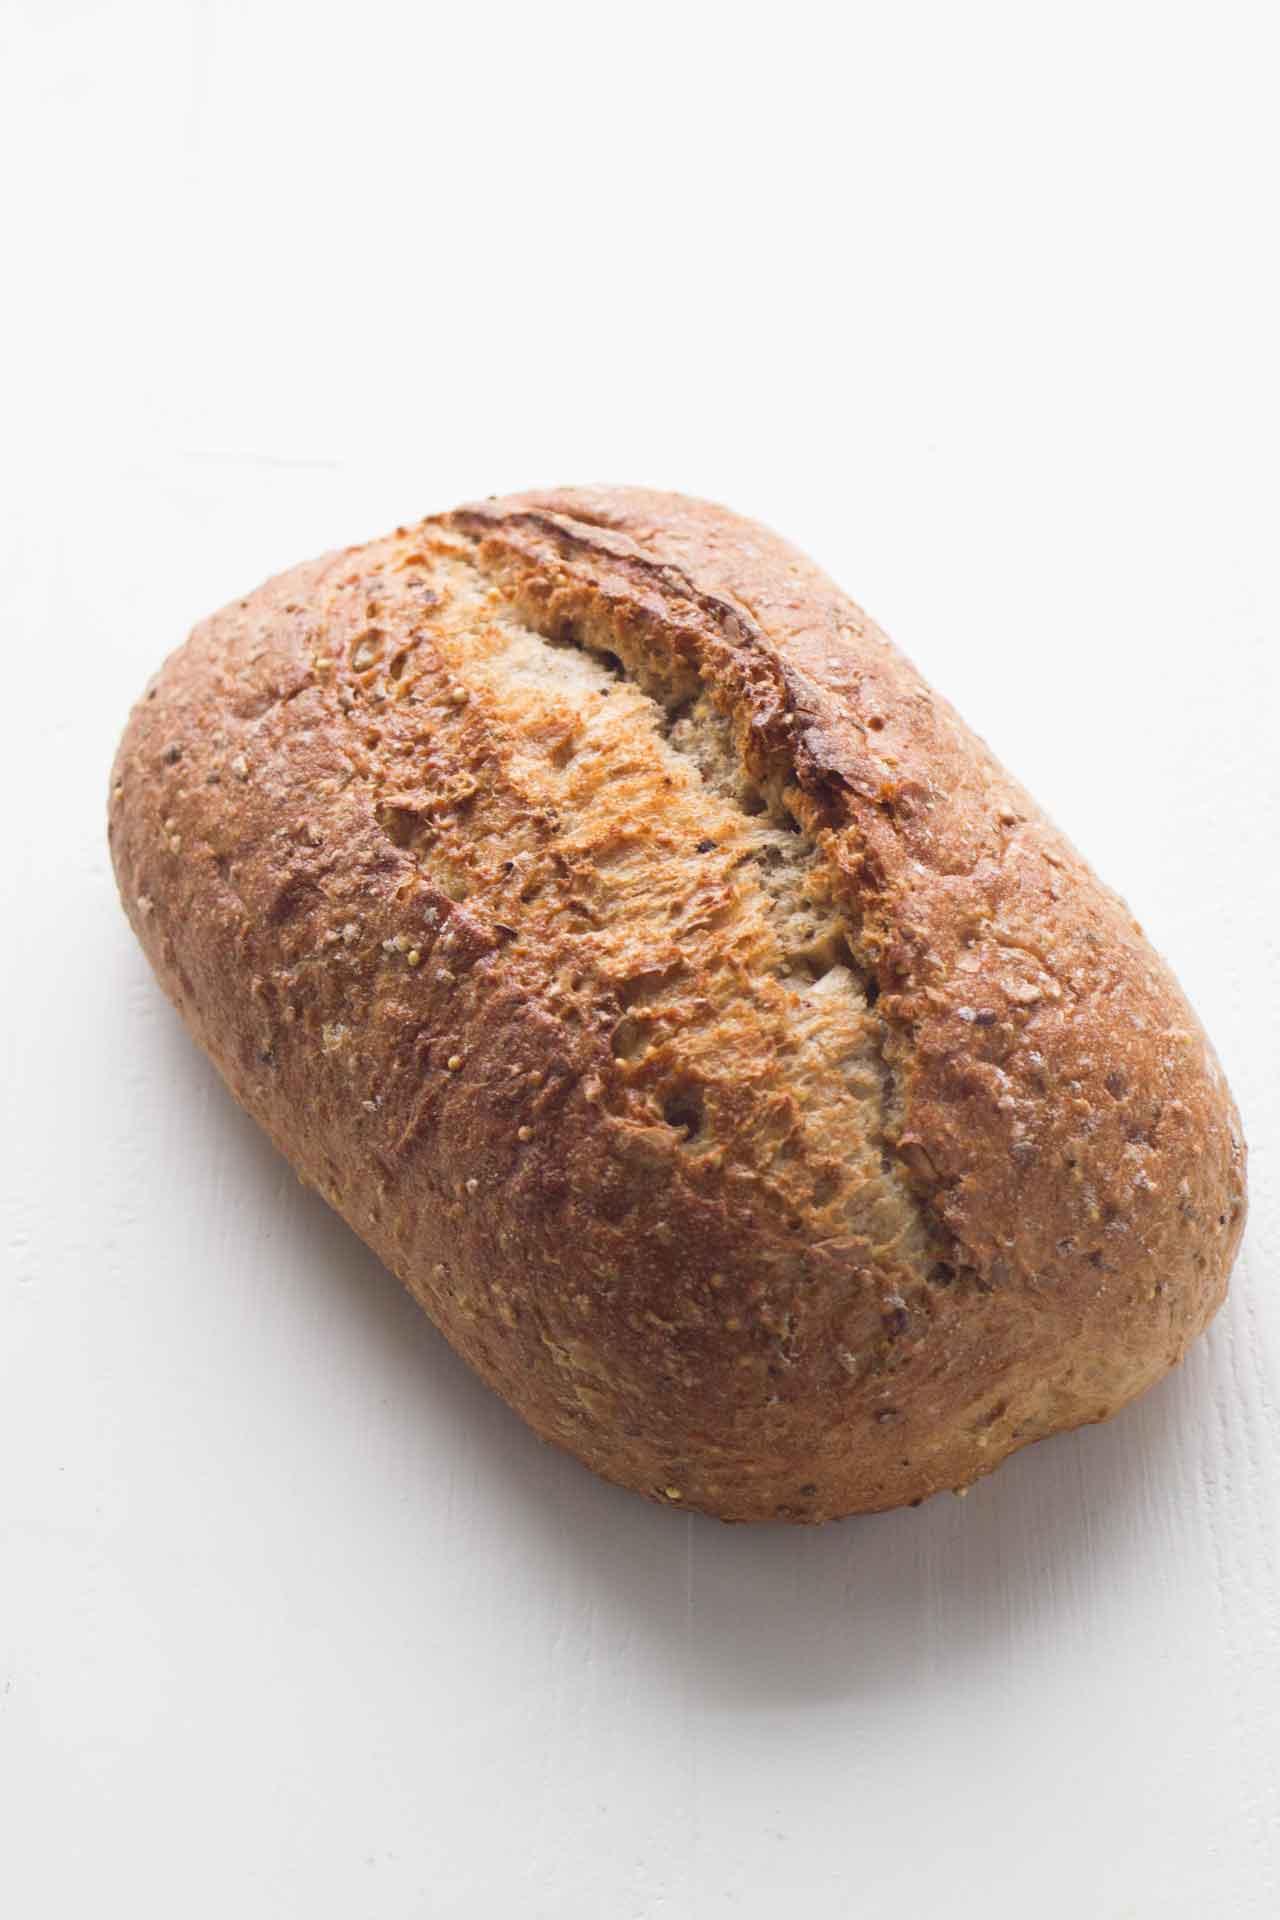 The Best Avocado Toast | https://eatwithinyourmeans.com